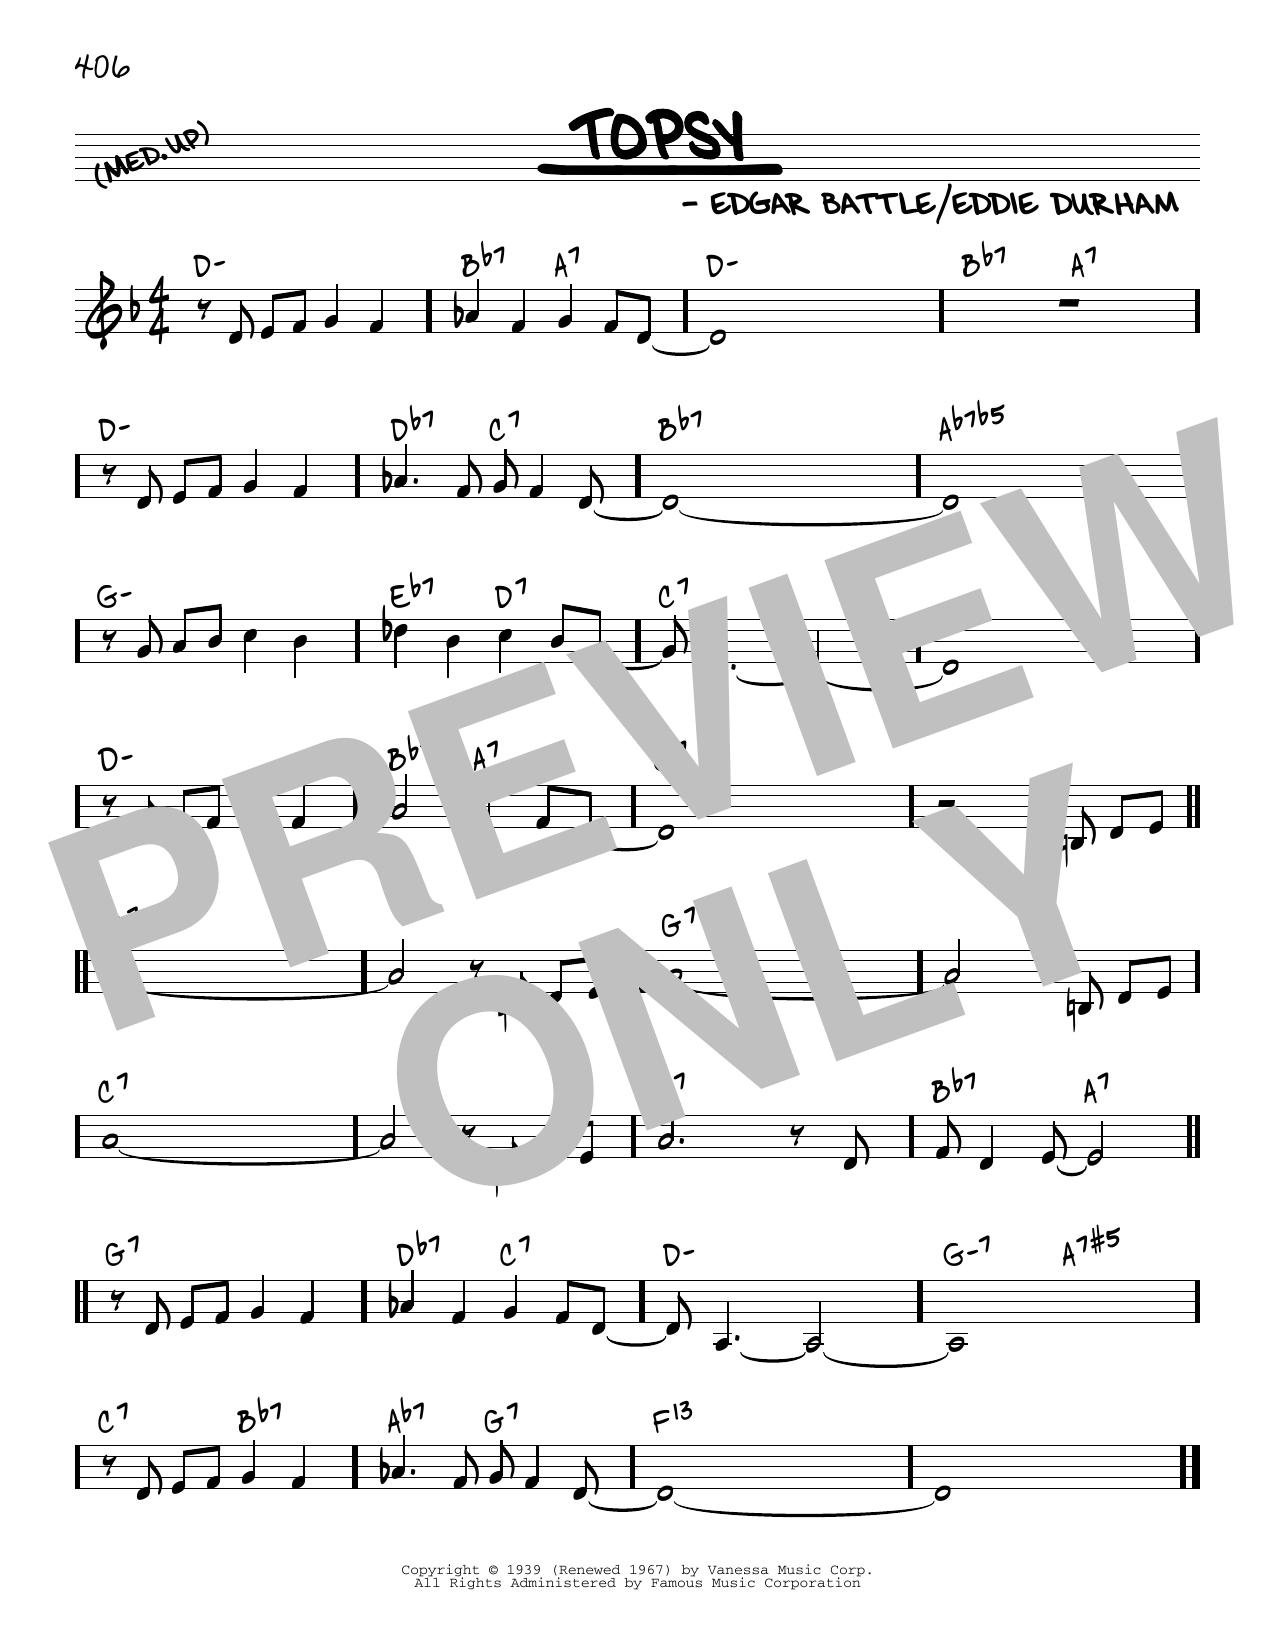 Cozy Cole Topsy [Reharmonized version] (arr. Jack Grassel) sheet music notes printable PDF score